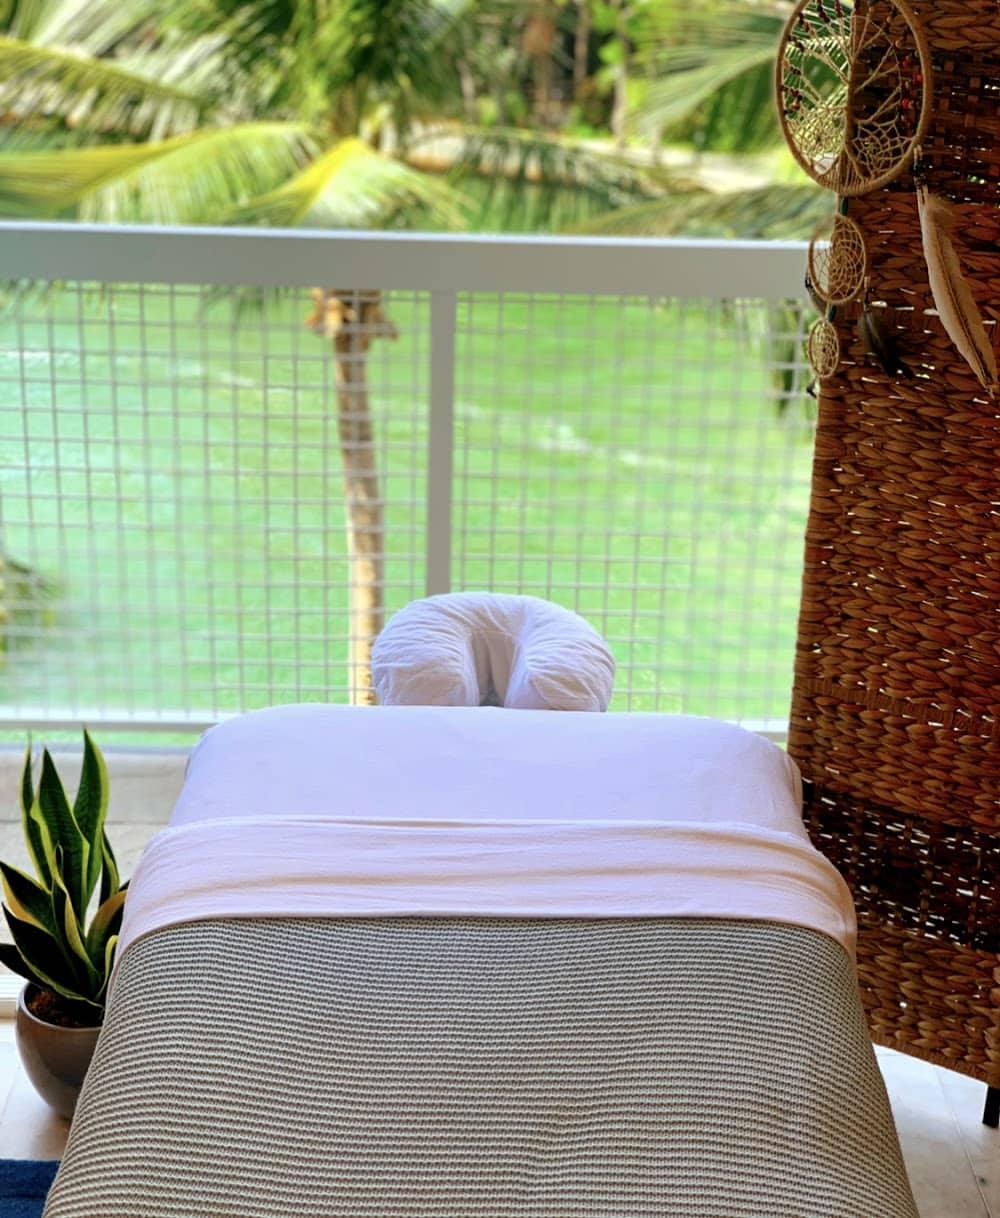 Carmen Barcelona Bodywork & Massage Therapy